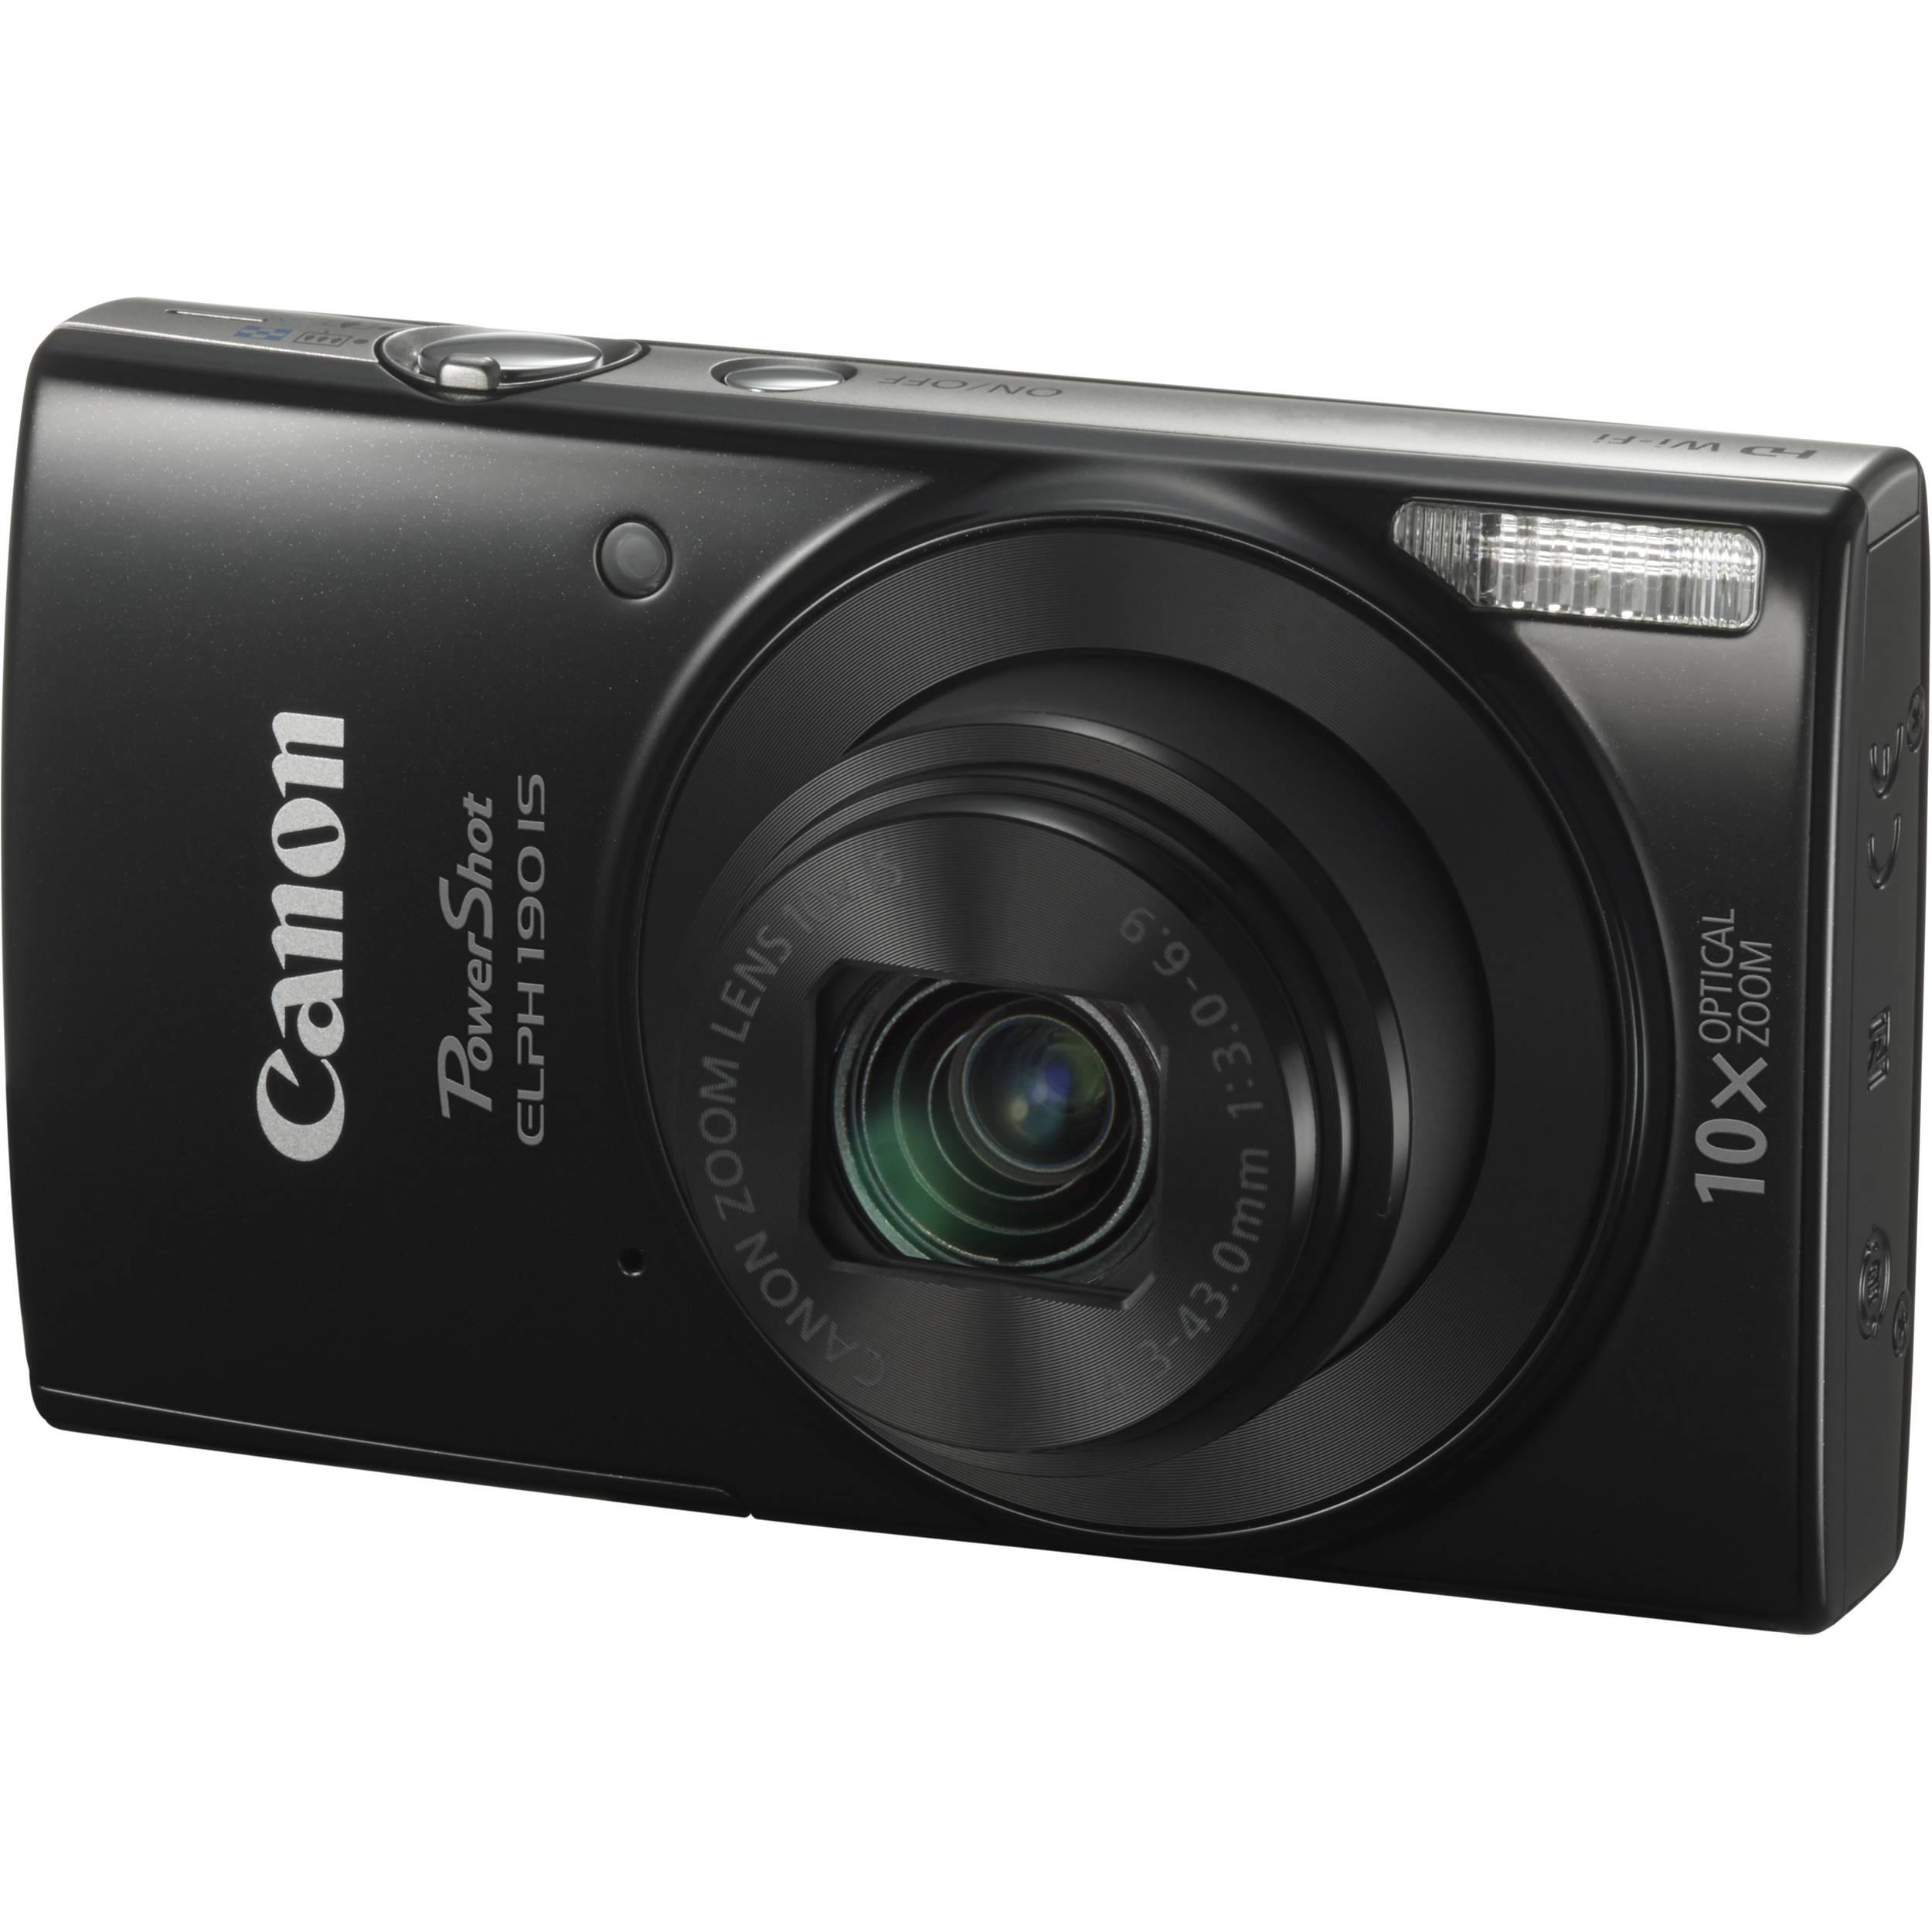 Canon PowerShot ELPH 190 IS Digital Camera (Black) 1084C001 B&H